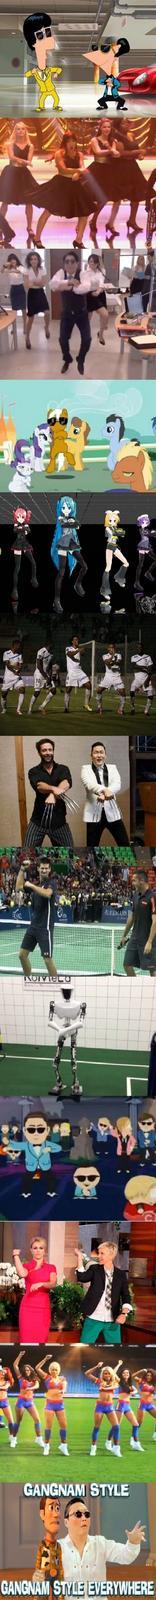 Gangnam Style, Gangnam Style everywhere